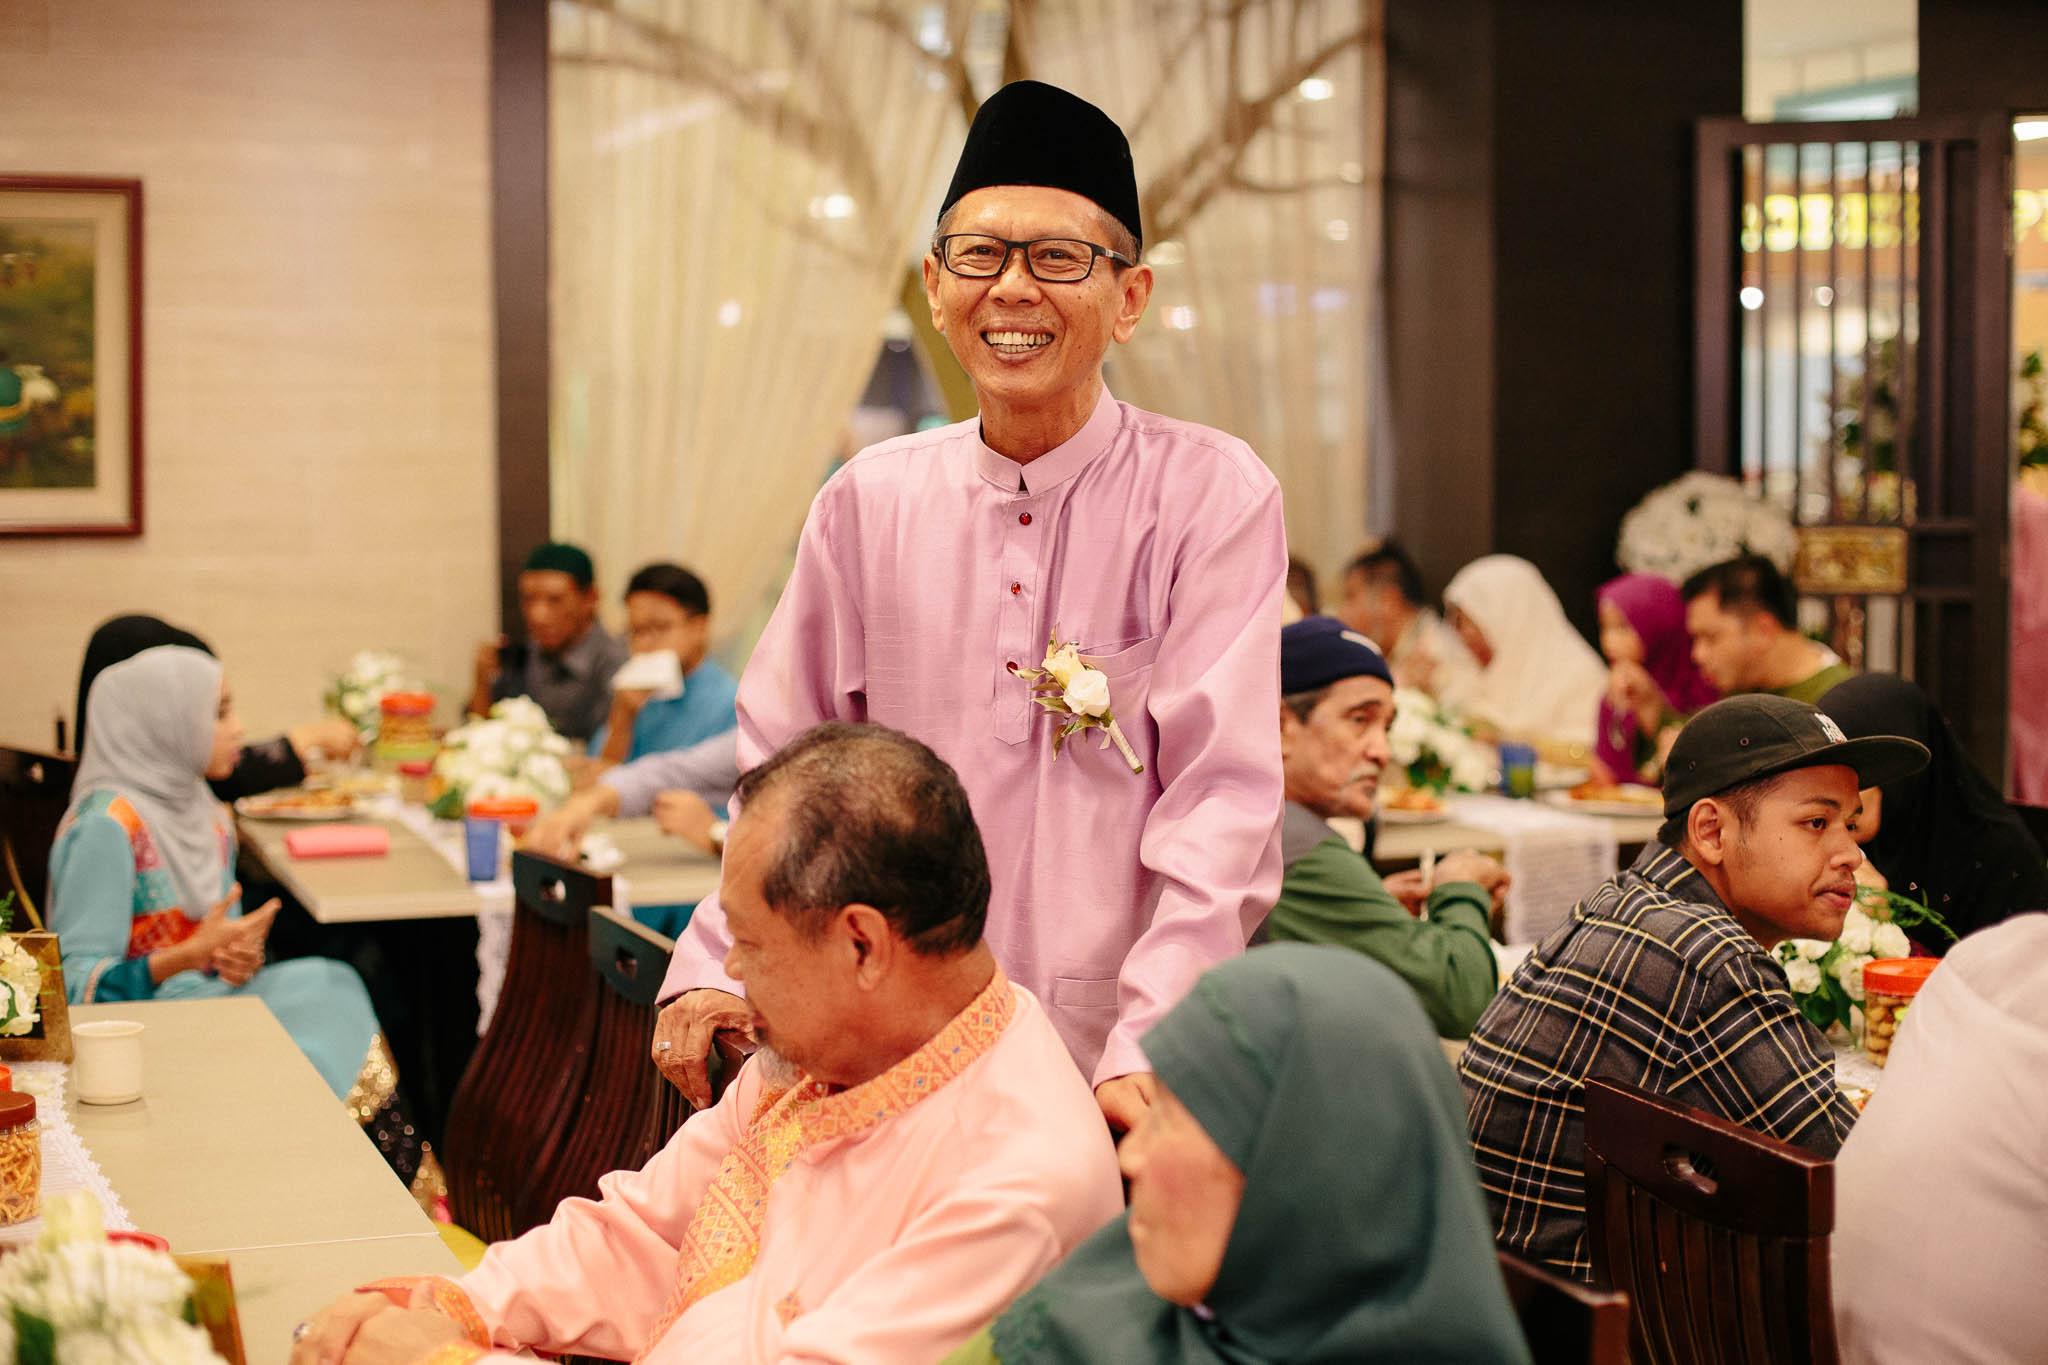 singapore-wedding-photographer-sharalyn-syazwan-060.jpg